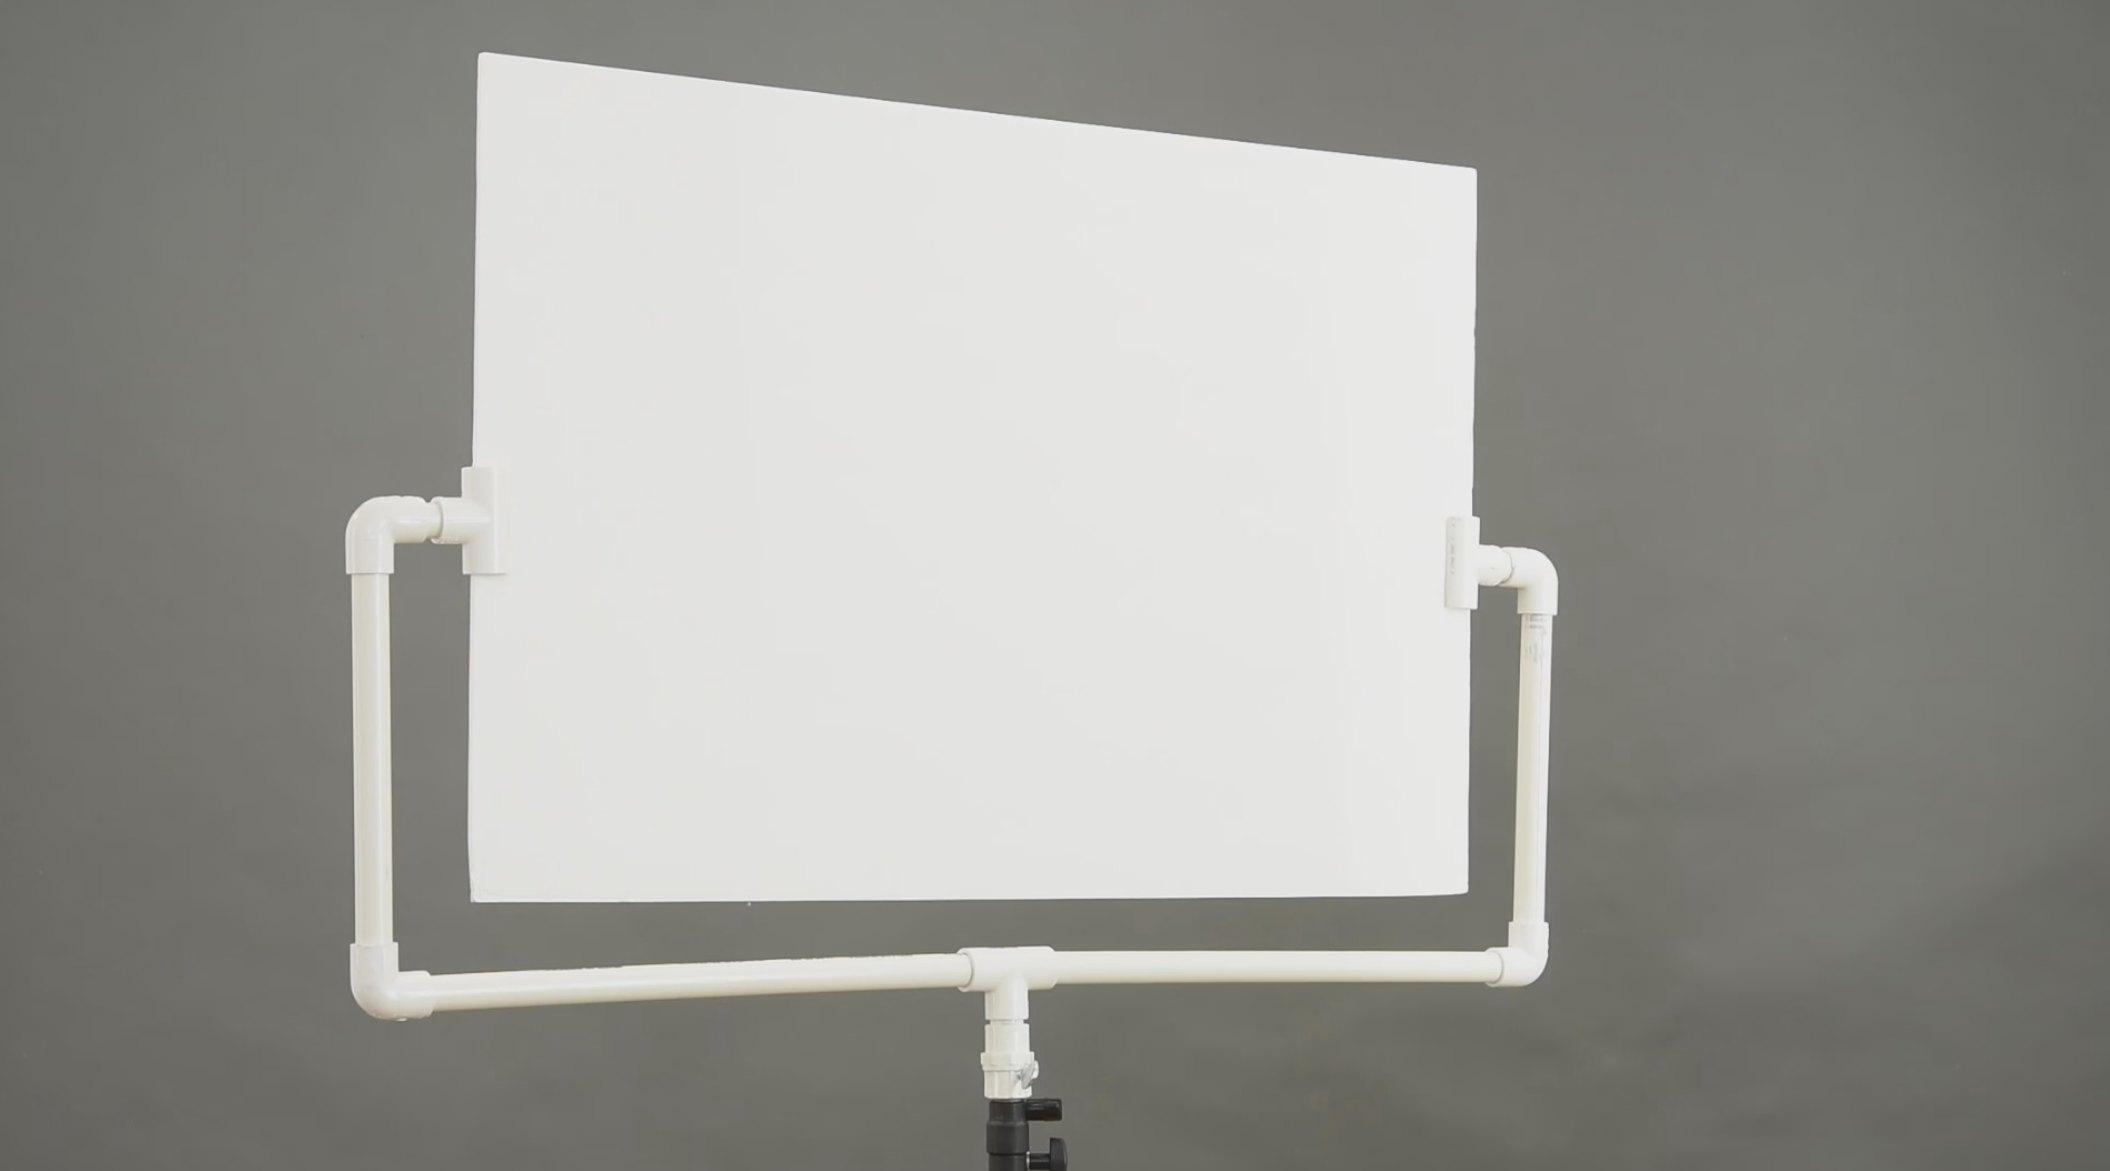 pvc-reflector-holder-05